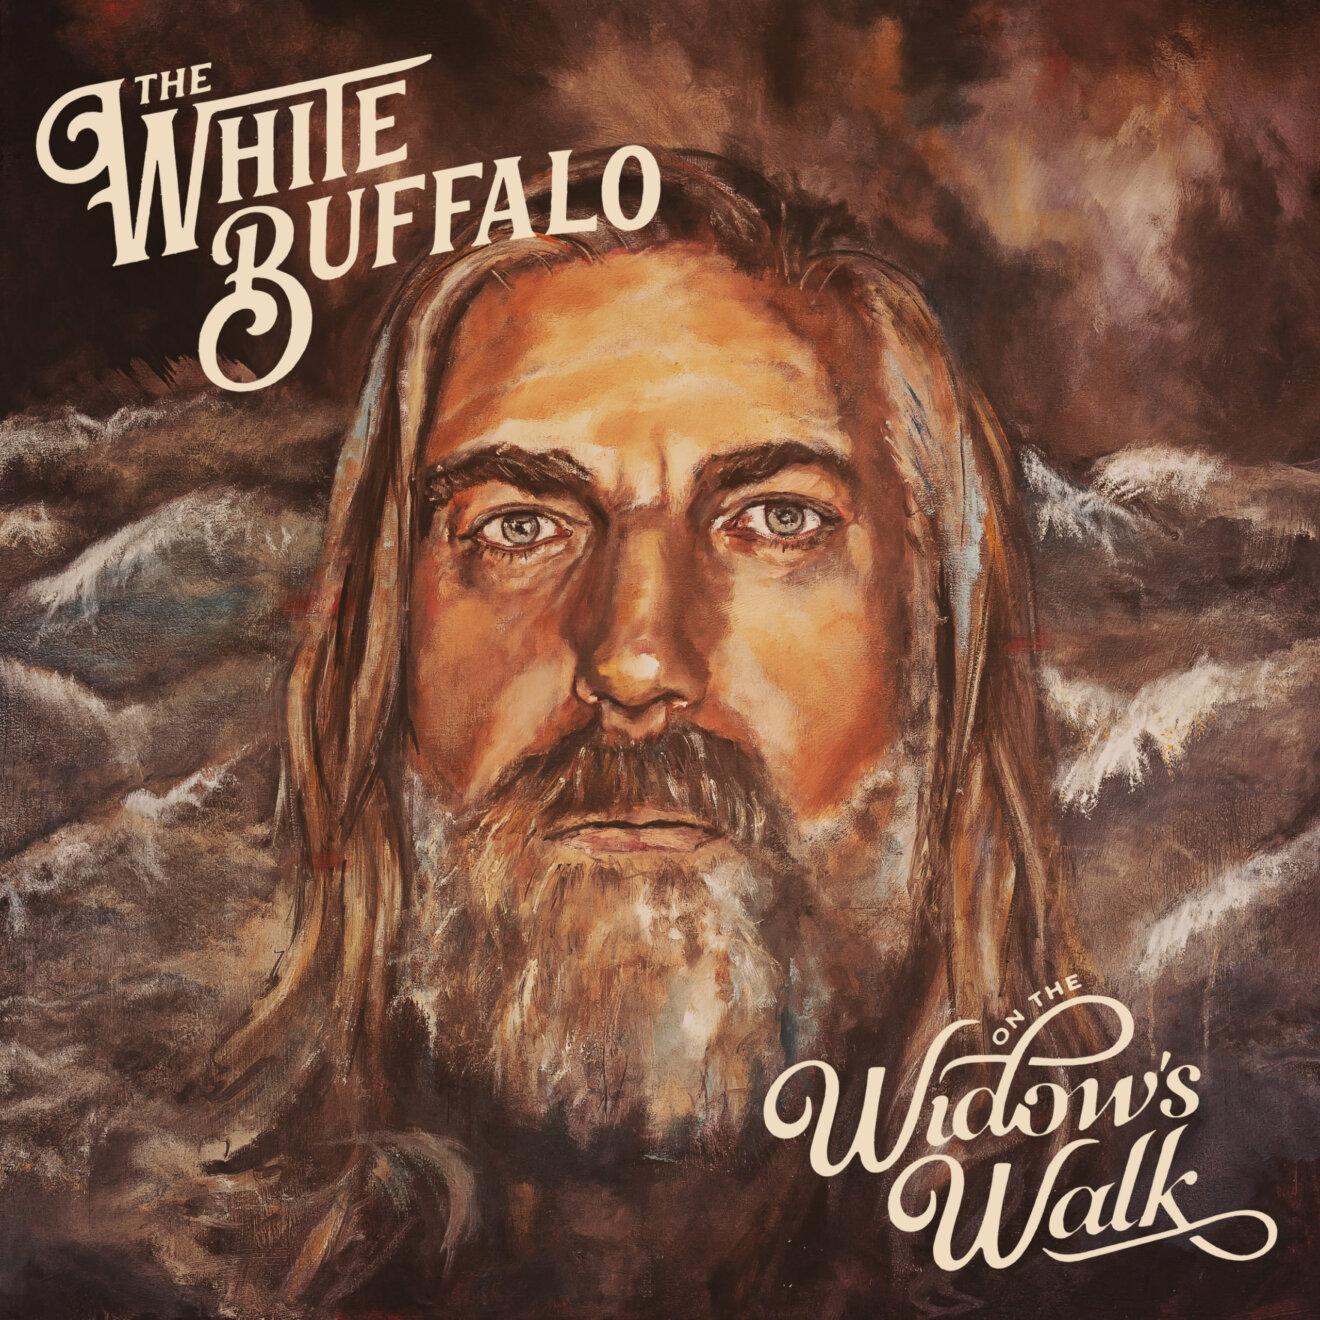 The White Buffalo On The Widows Walk